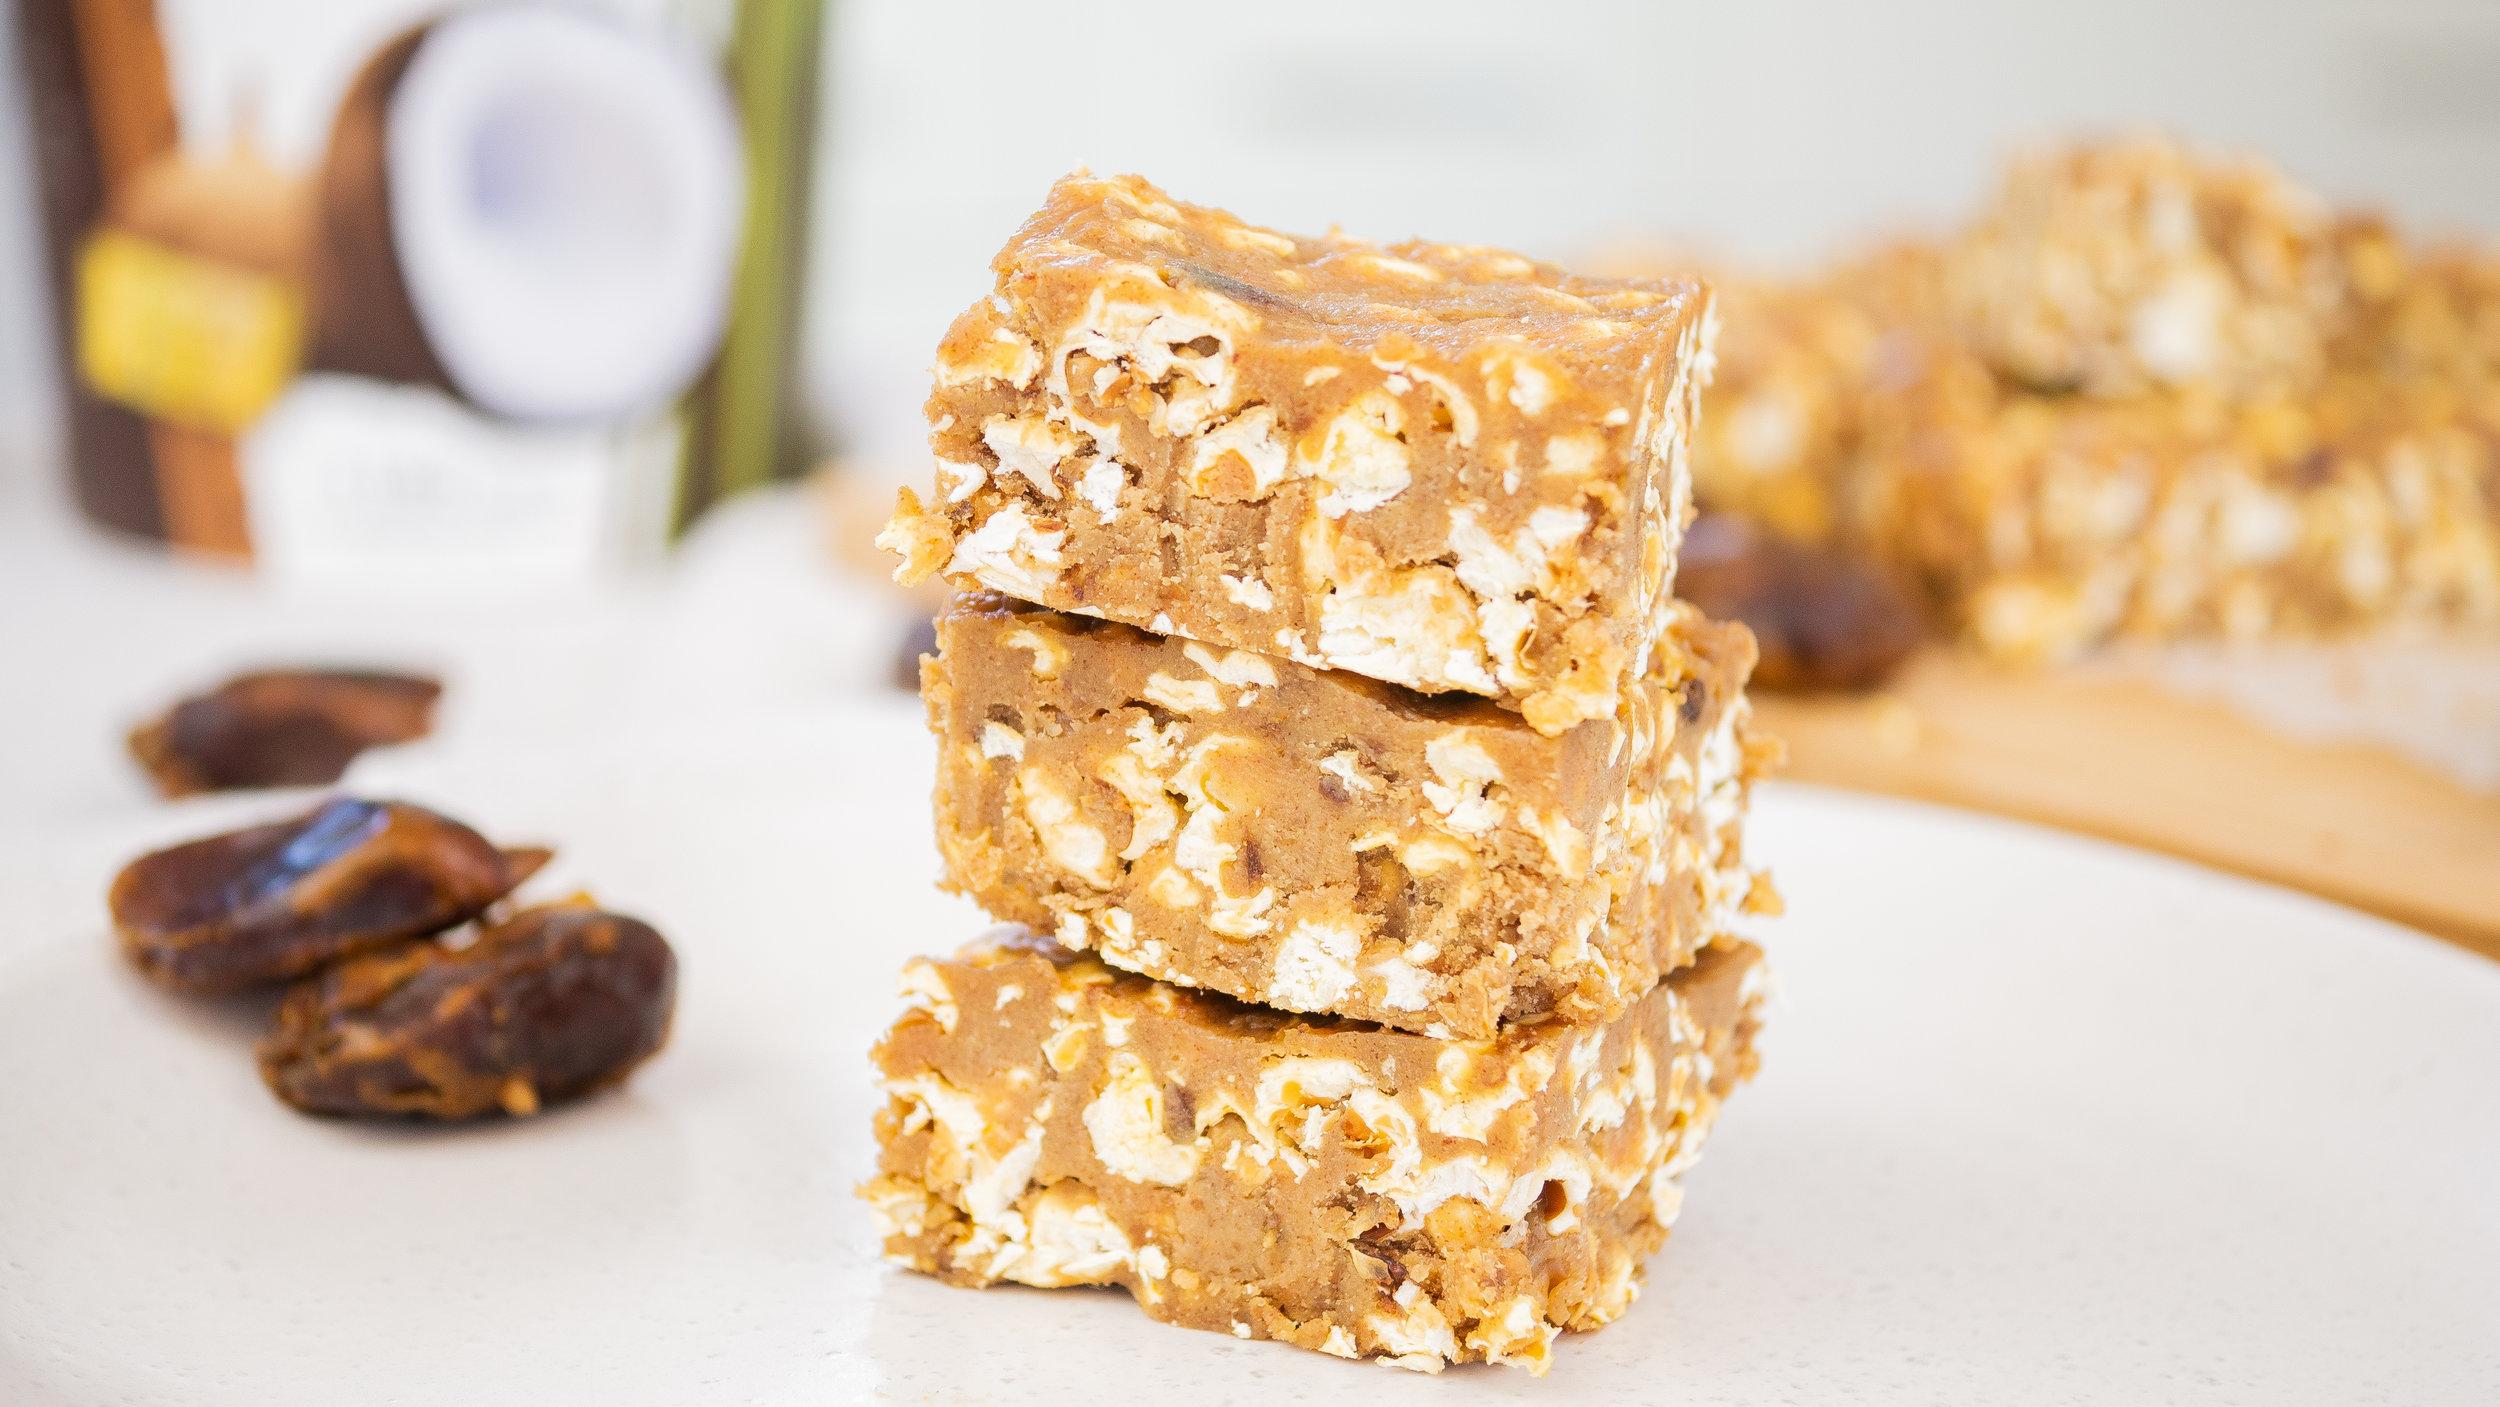 Peanut Butter & Caramel Popcorn Slice